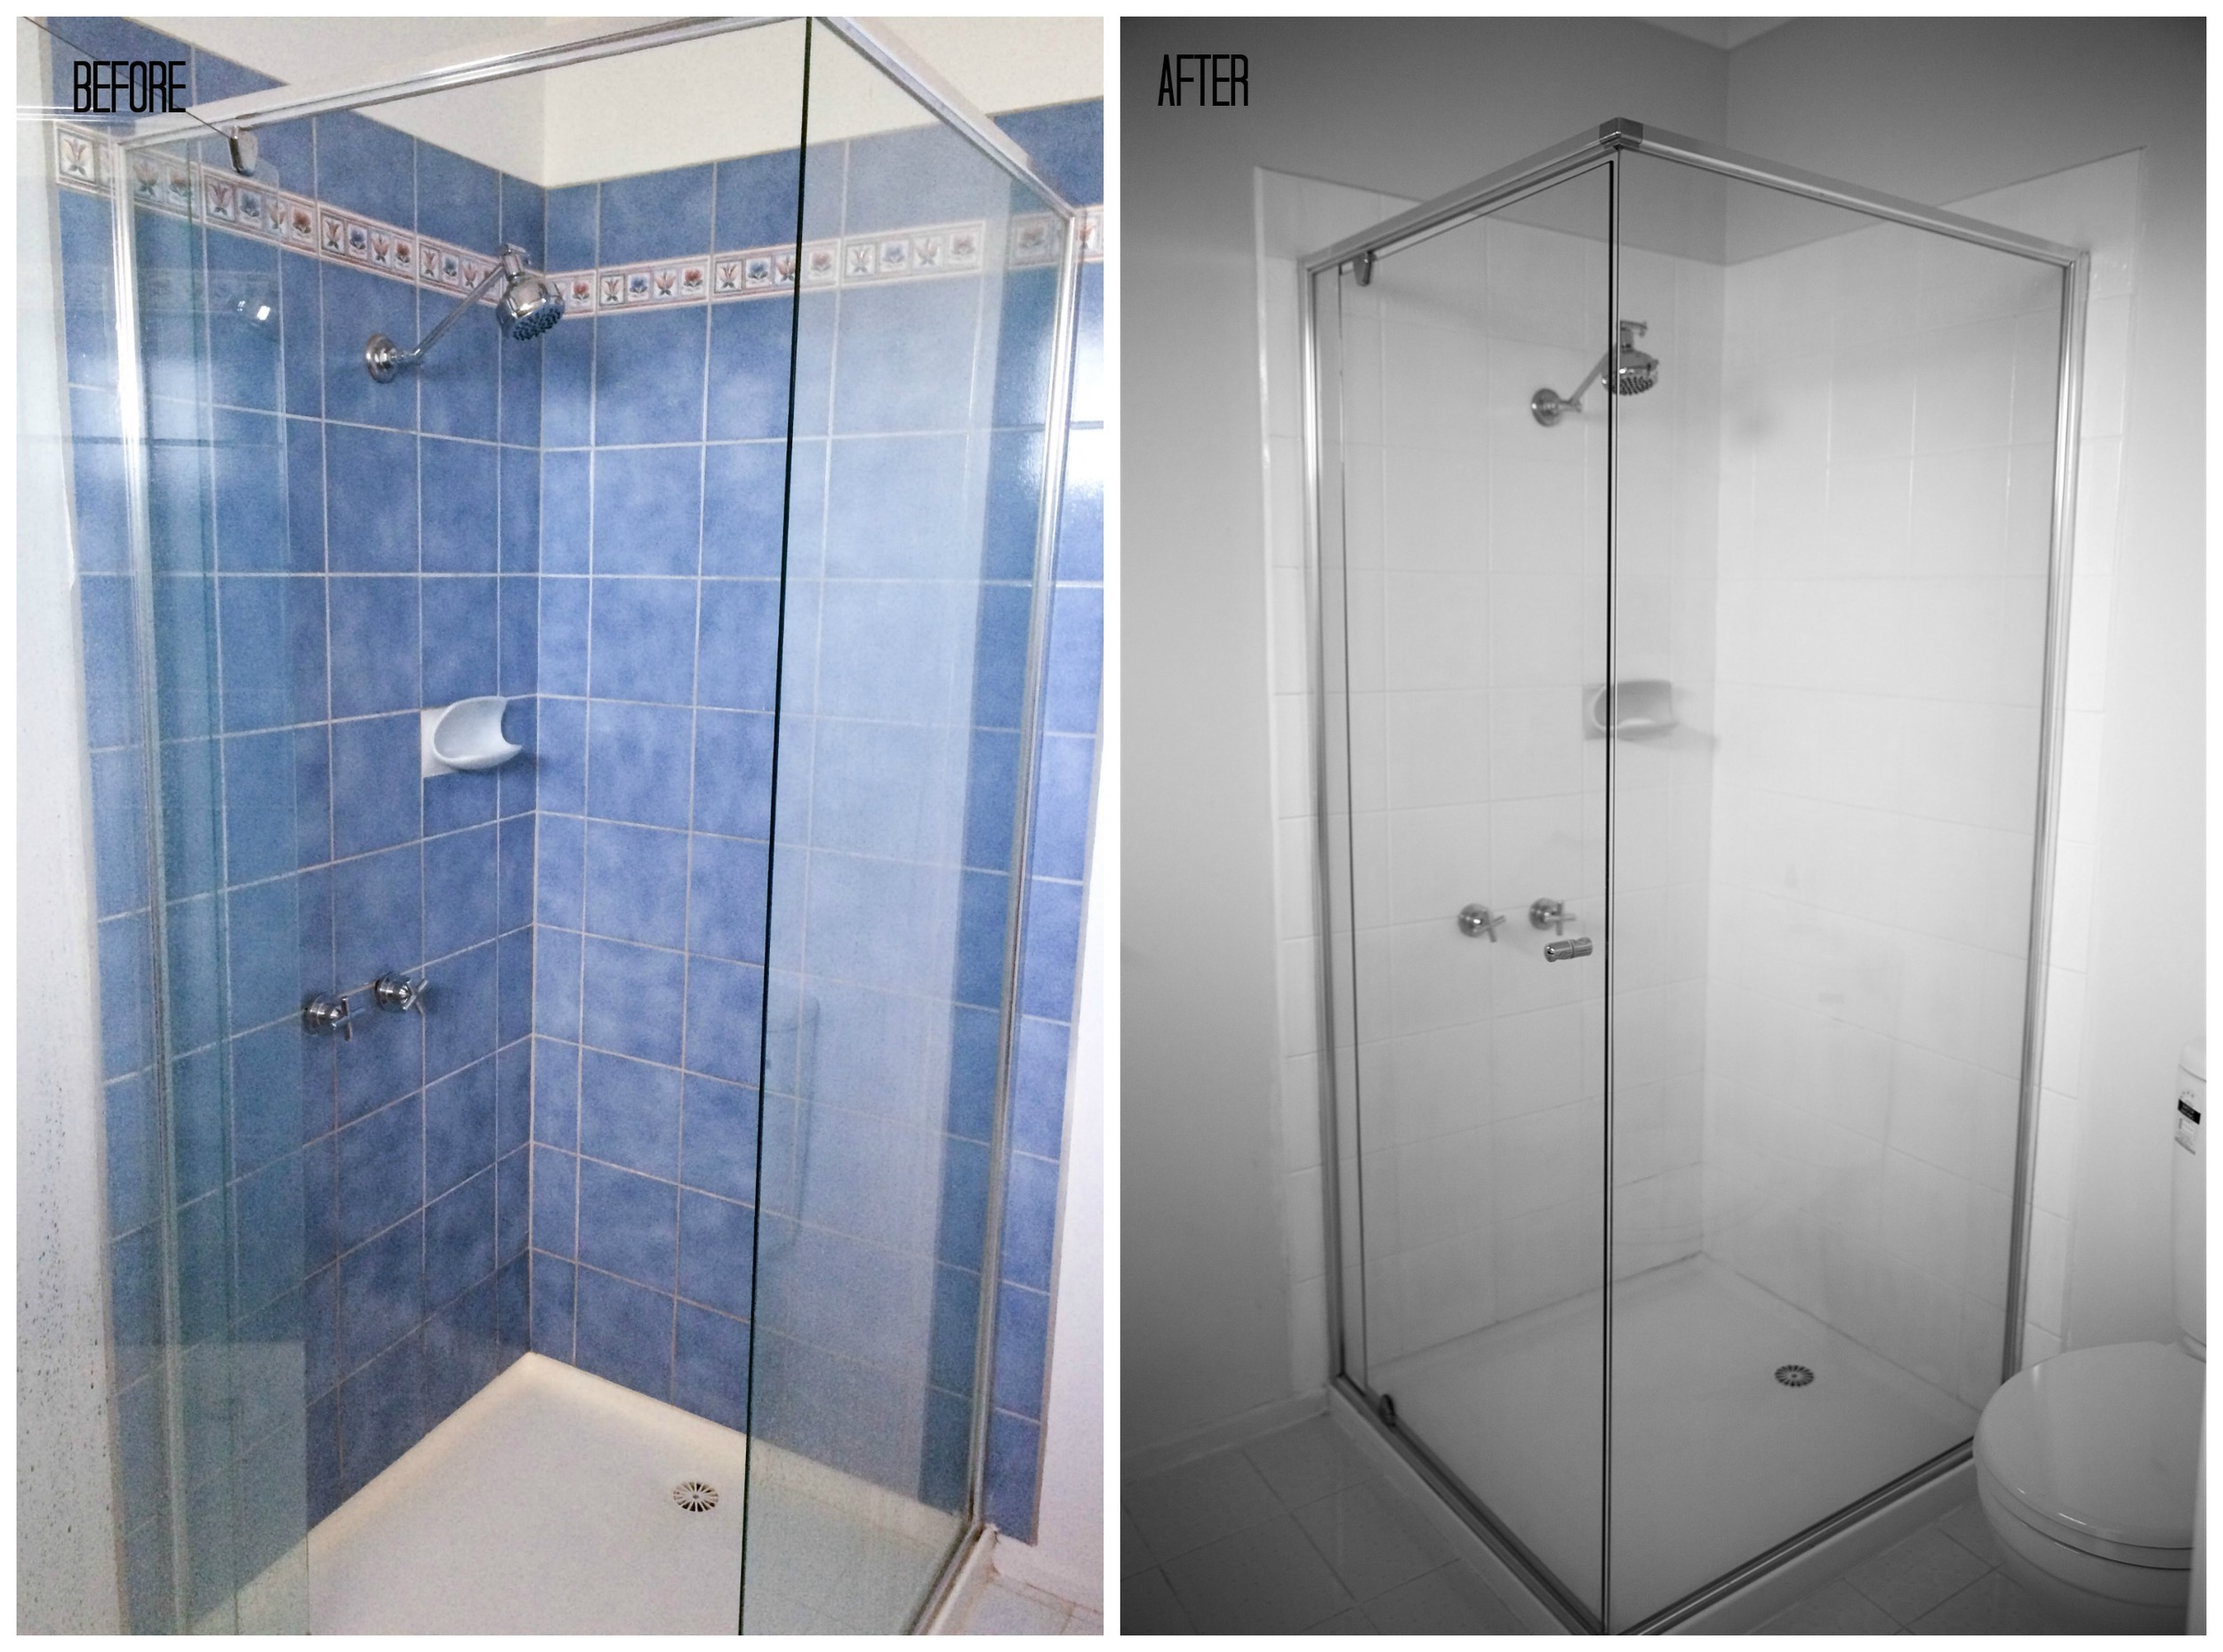 PicMonky Shower Before.jpg